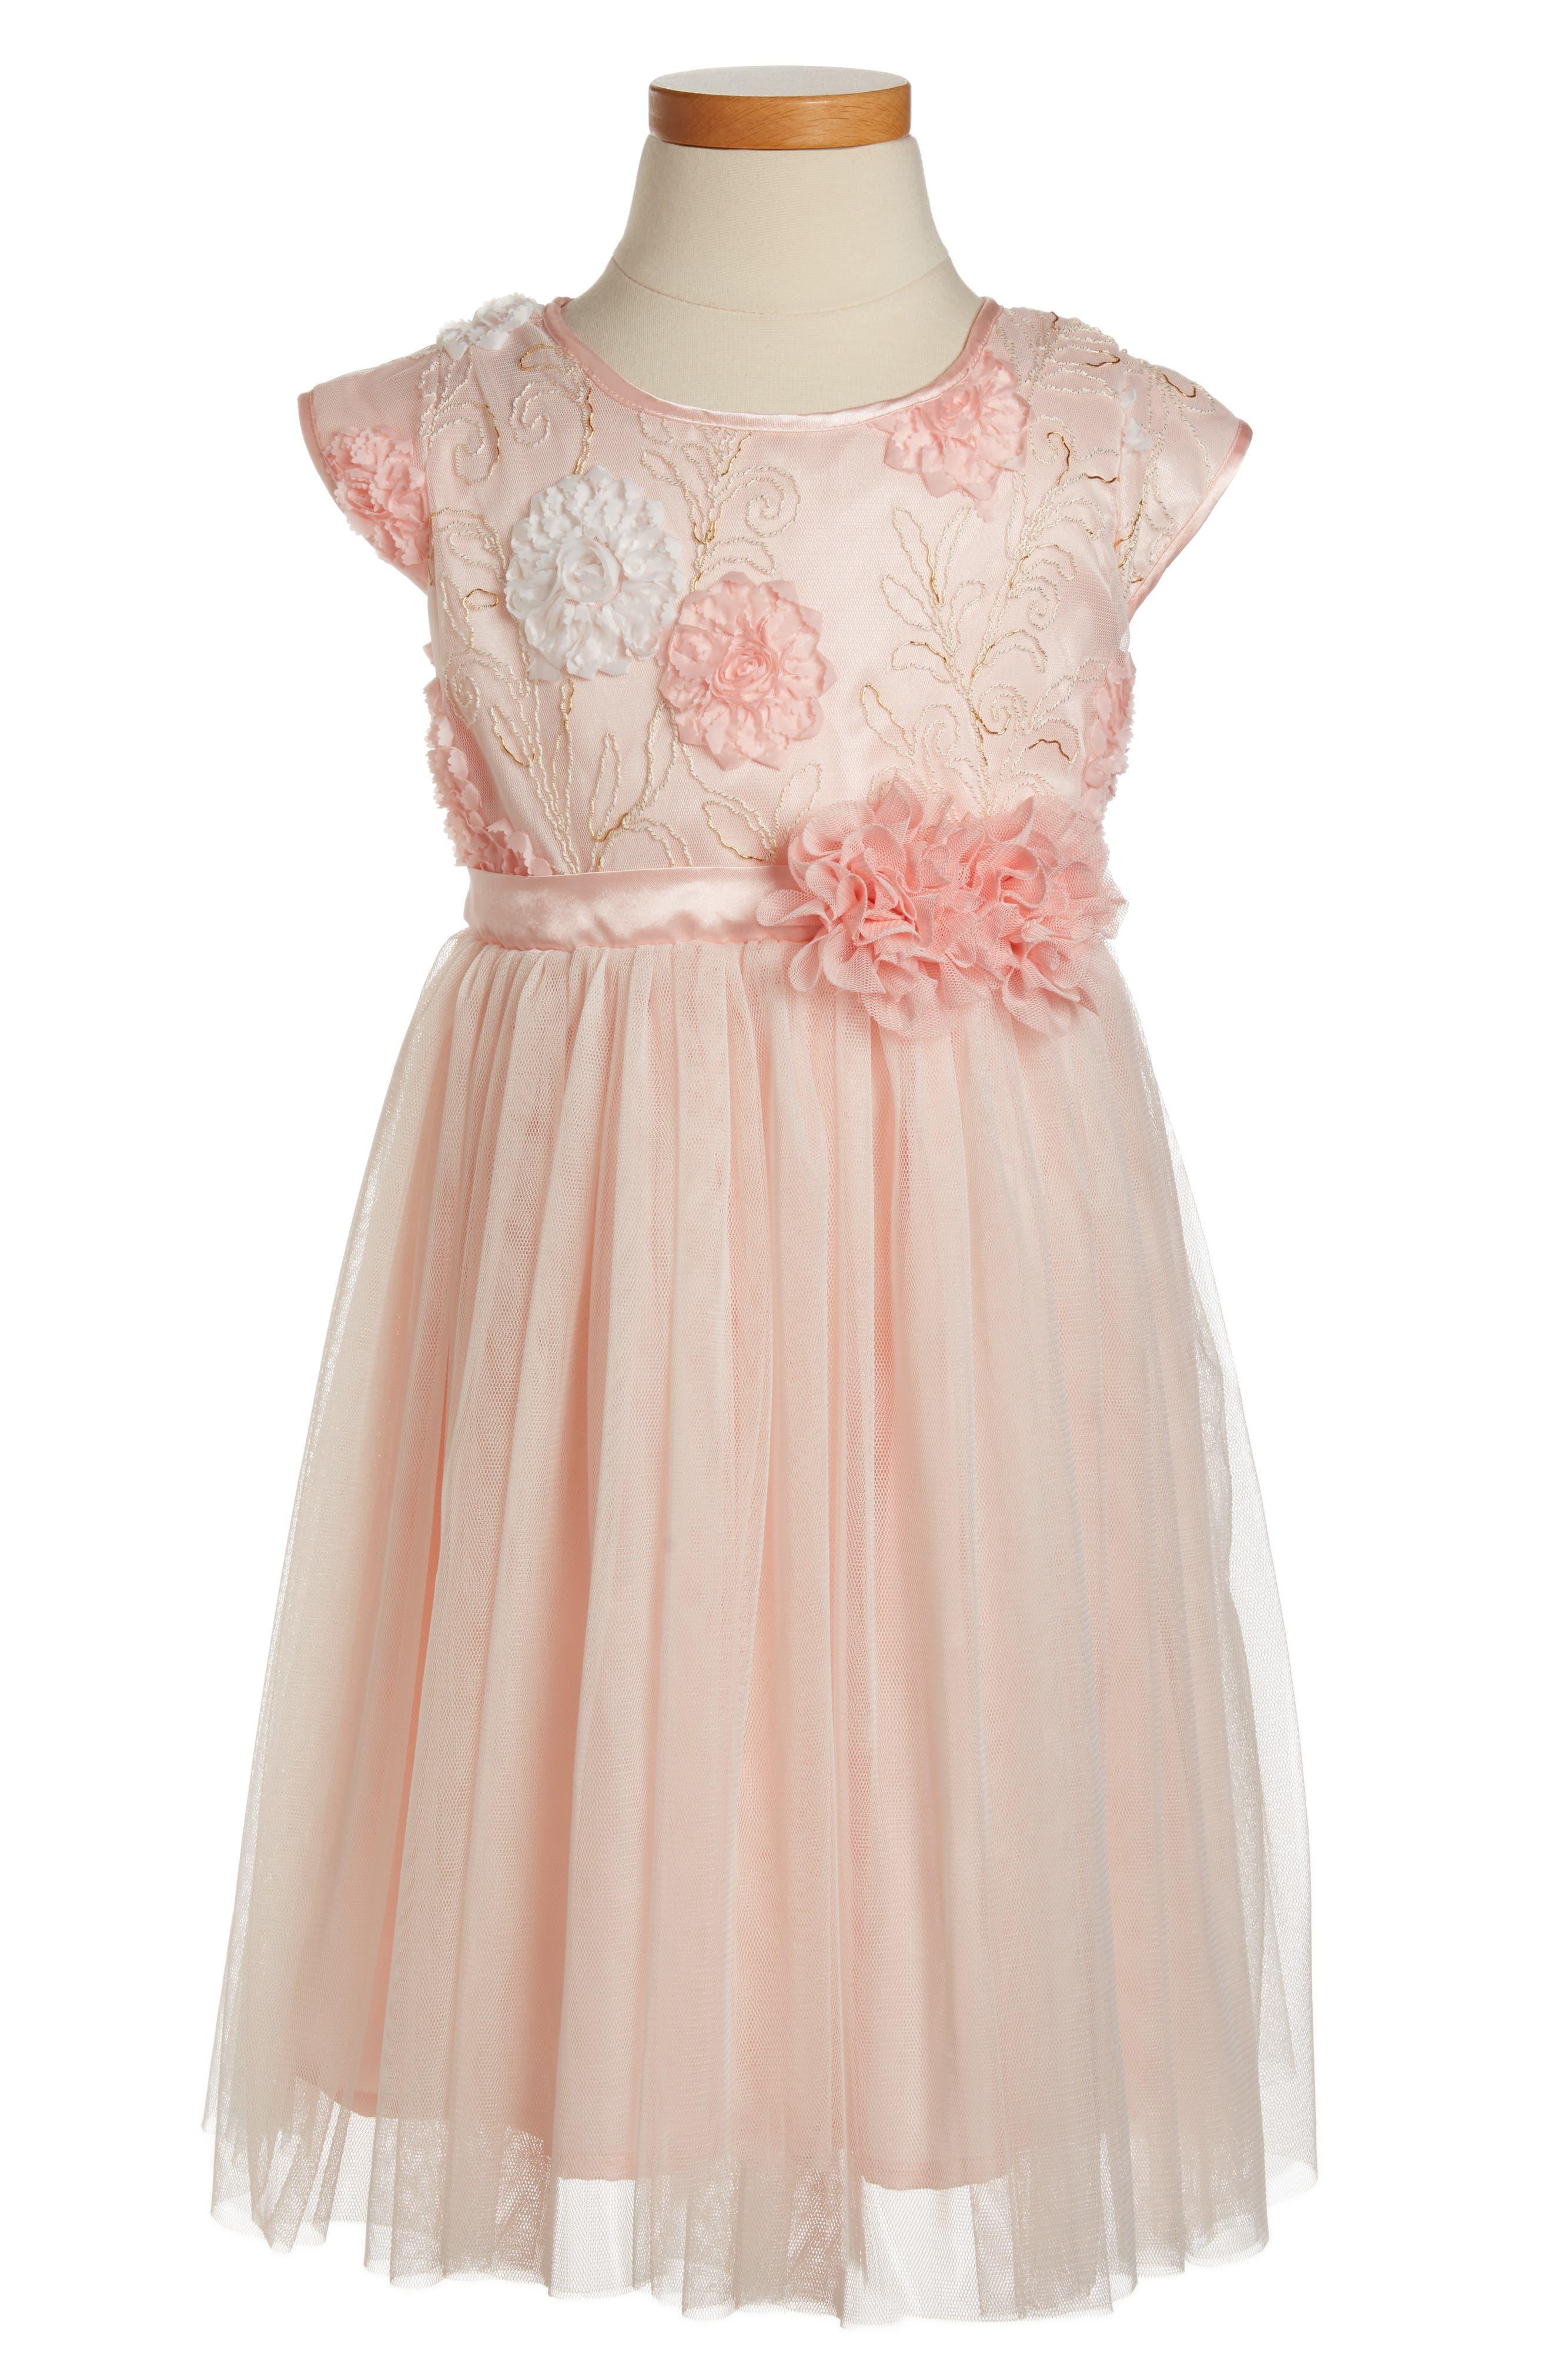 Golden Trim Flower Dress,                             Main thumbnail 1, color,                             Peach